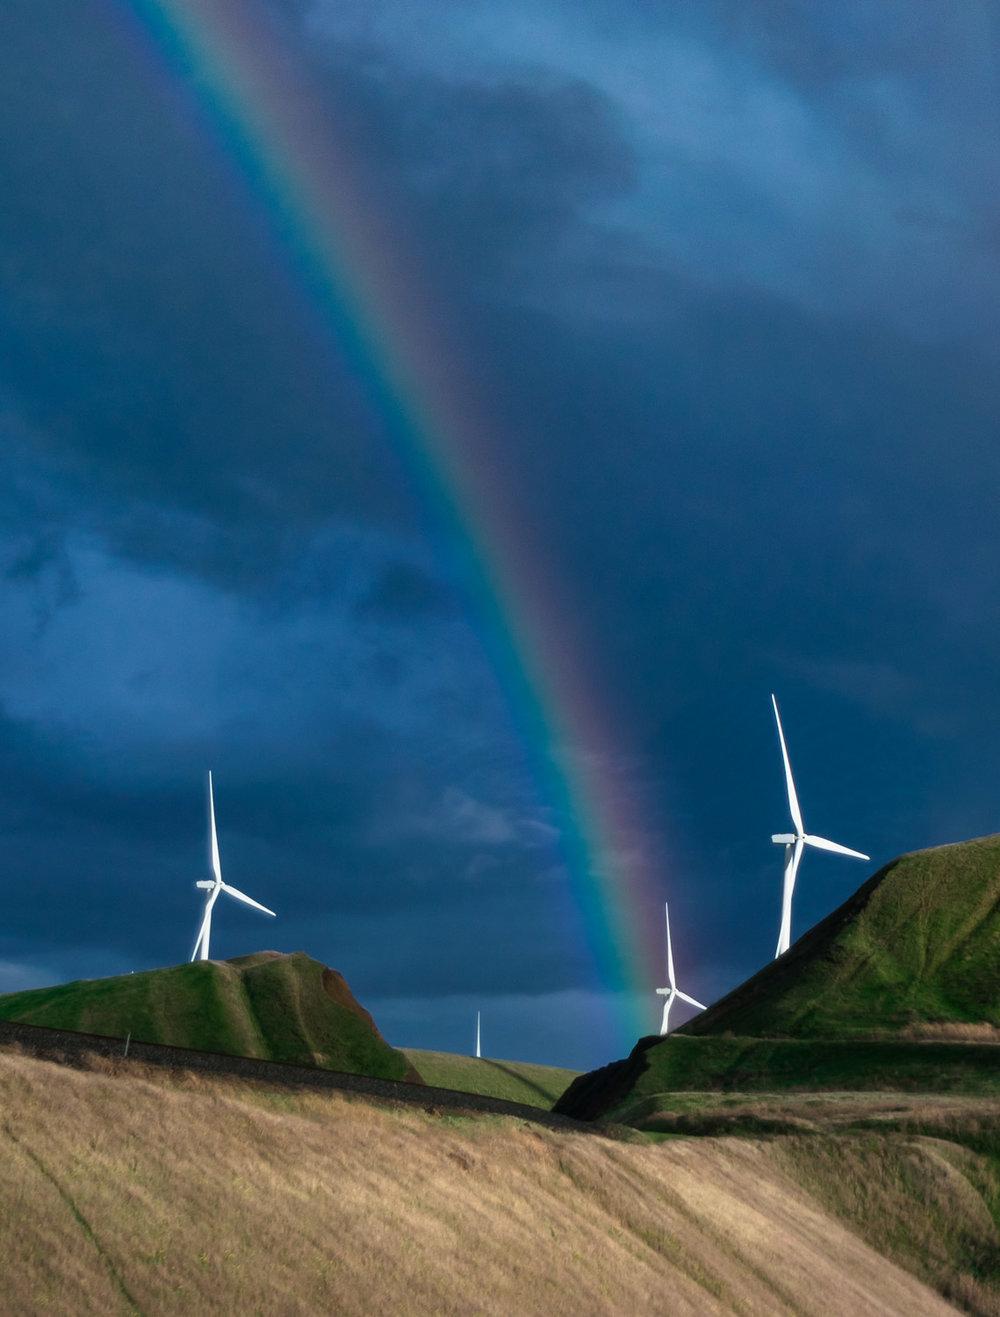 amaris-woo-photography-california-altamont-pass-wind-farm